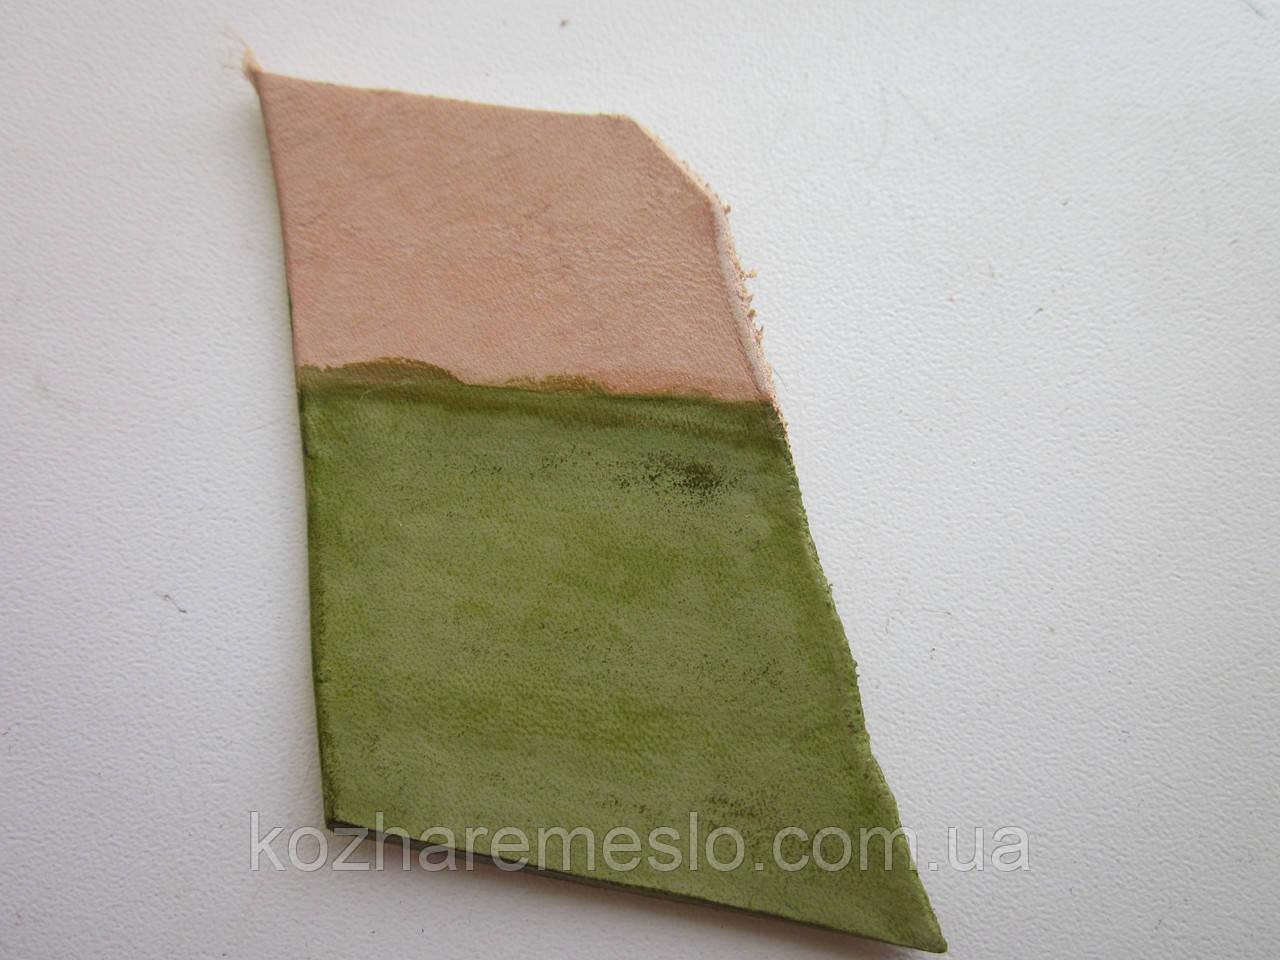 Краска для кожи WATERSTAIN Fenice на водной основе 200 мл зелёная светлая (Италия)